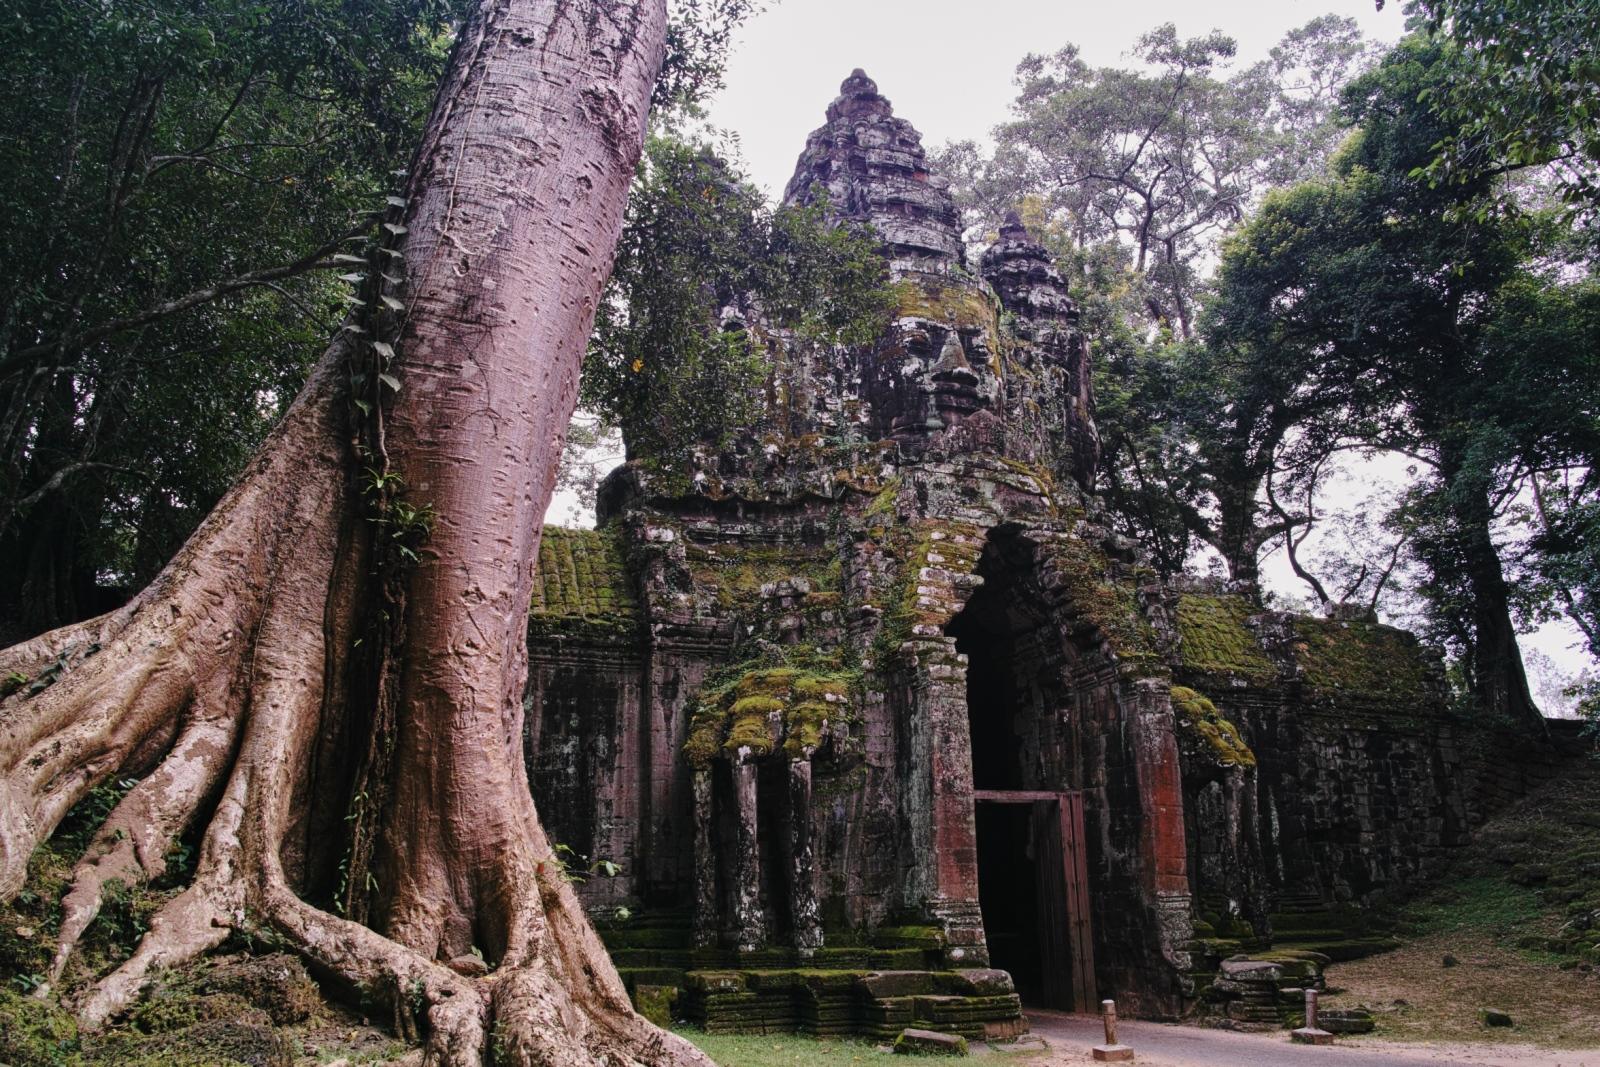 Gate of Angkor Thom